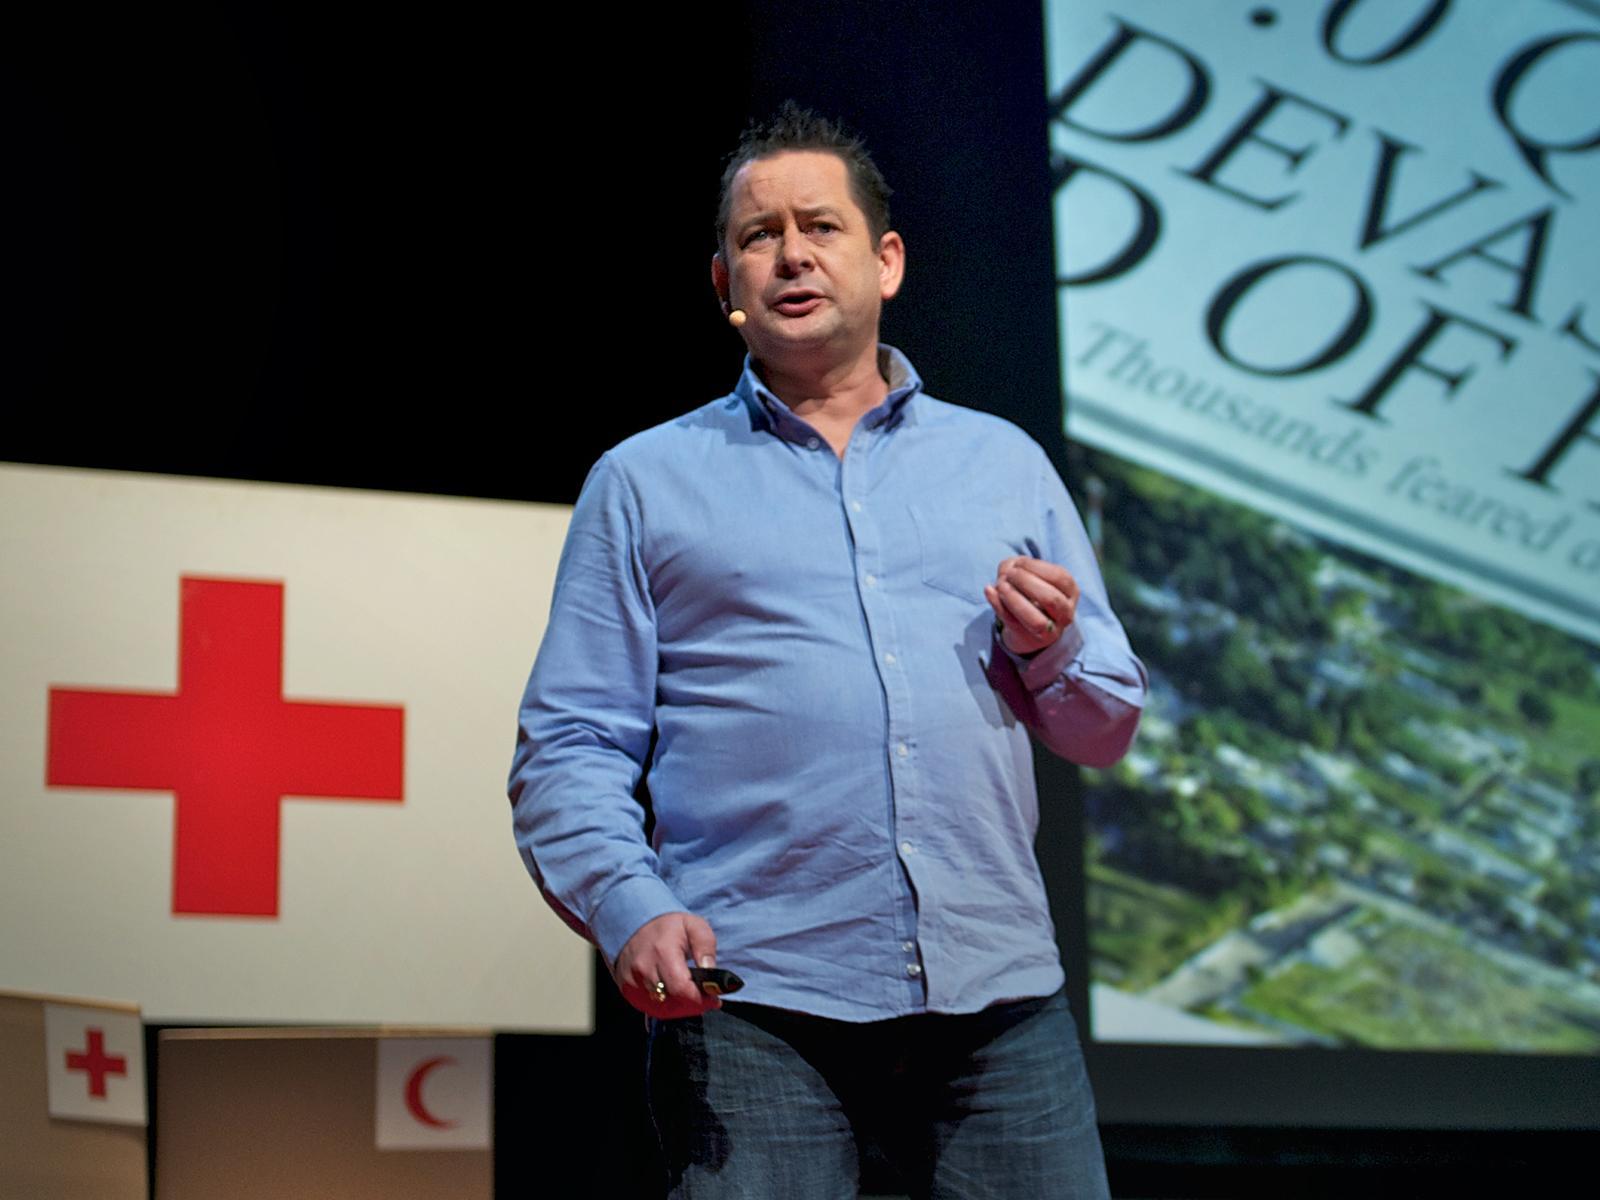 Paul Conneally digital humanitarianism